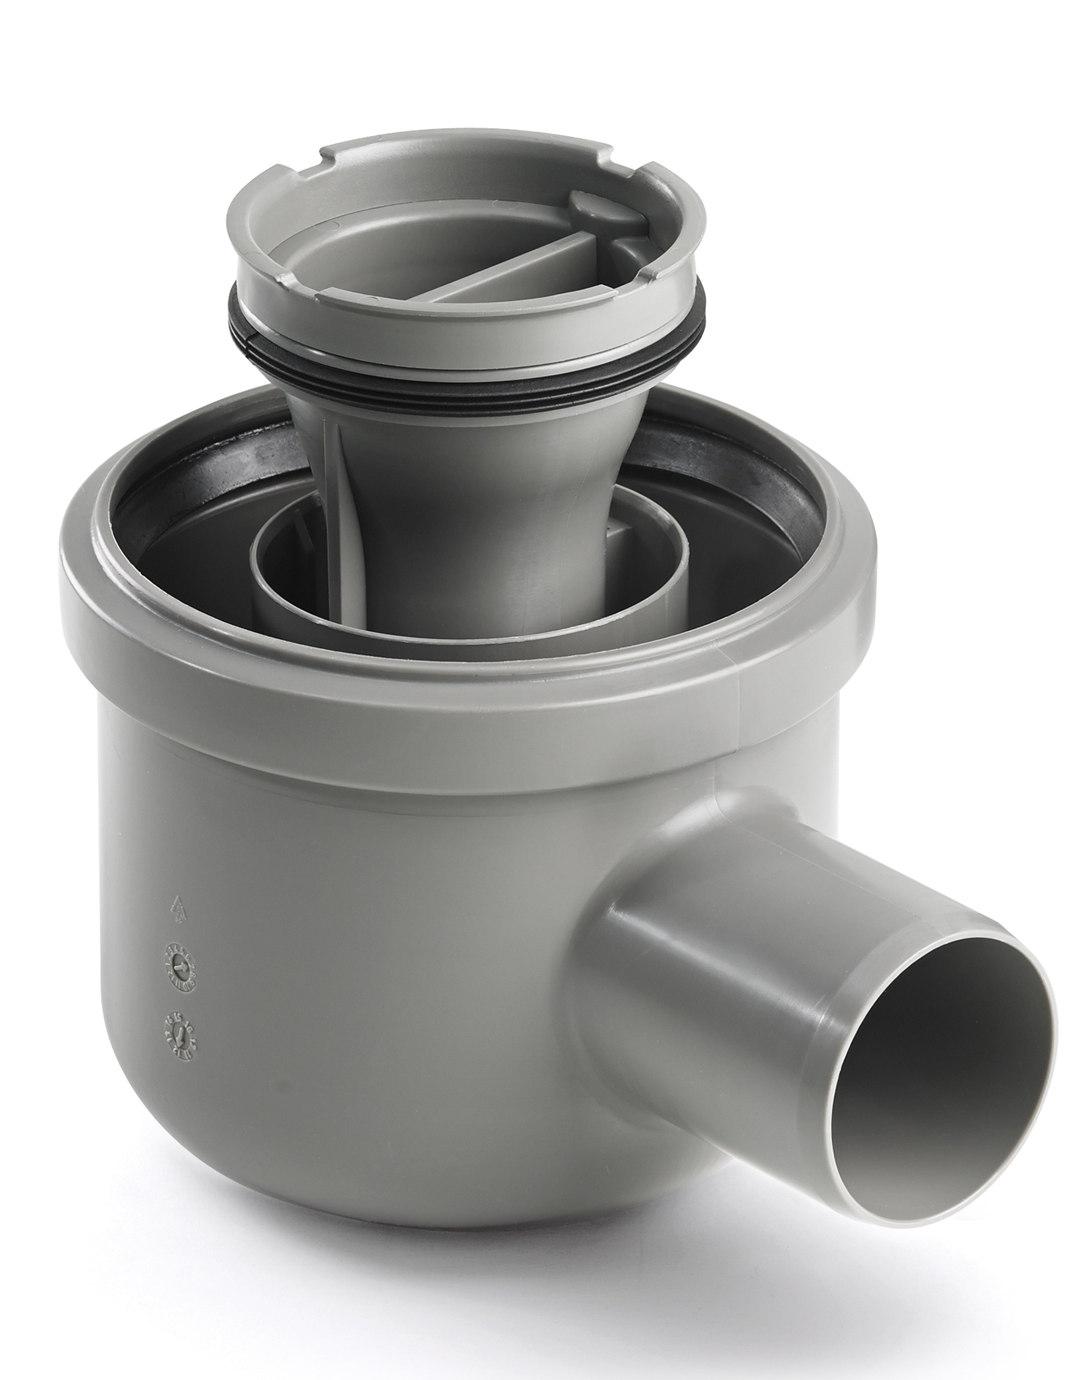 Viemärikaivo kulma 2411 vaaka 50 mm vesilukolla Unidrain  Taloon com